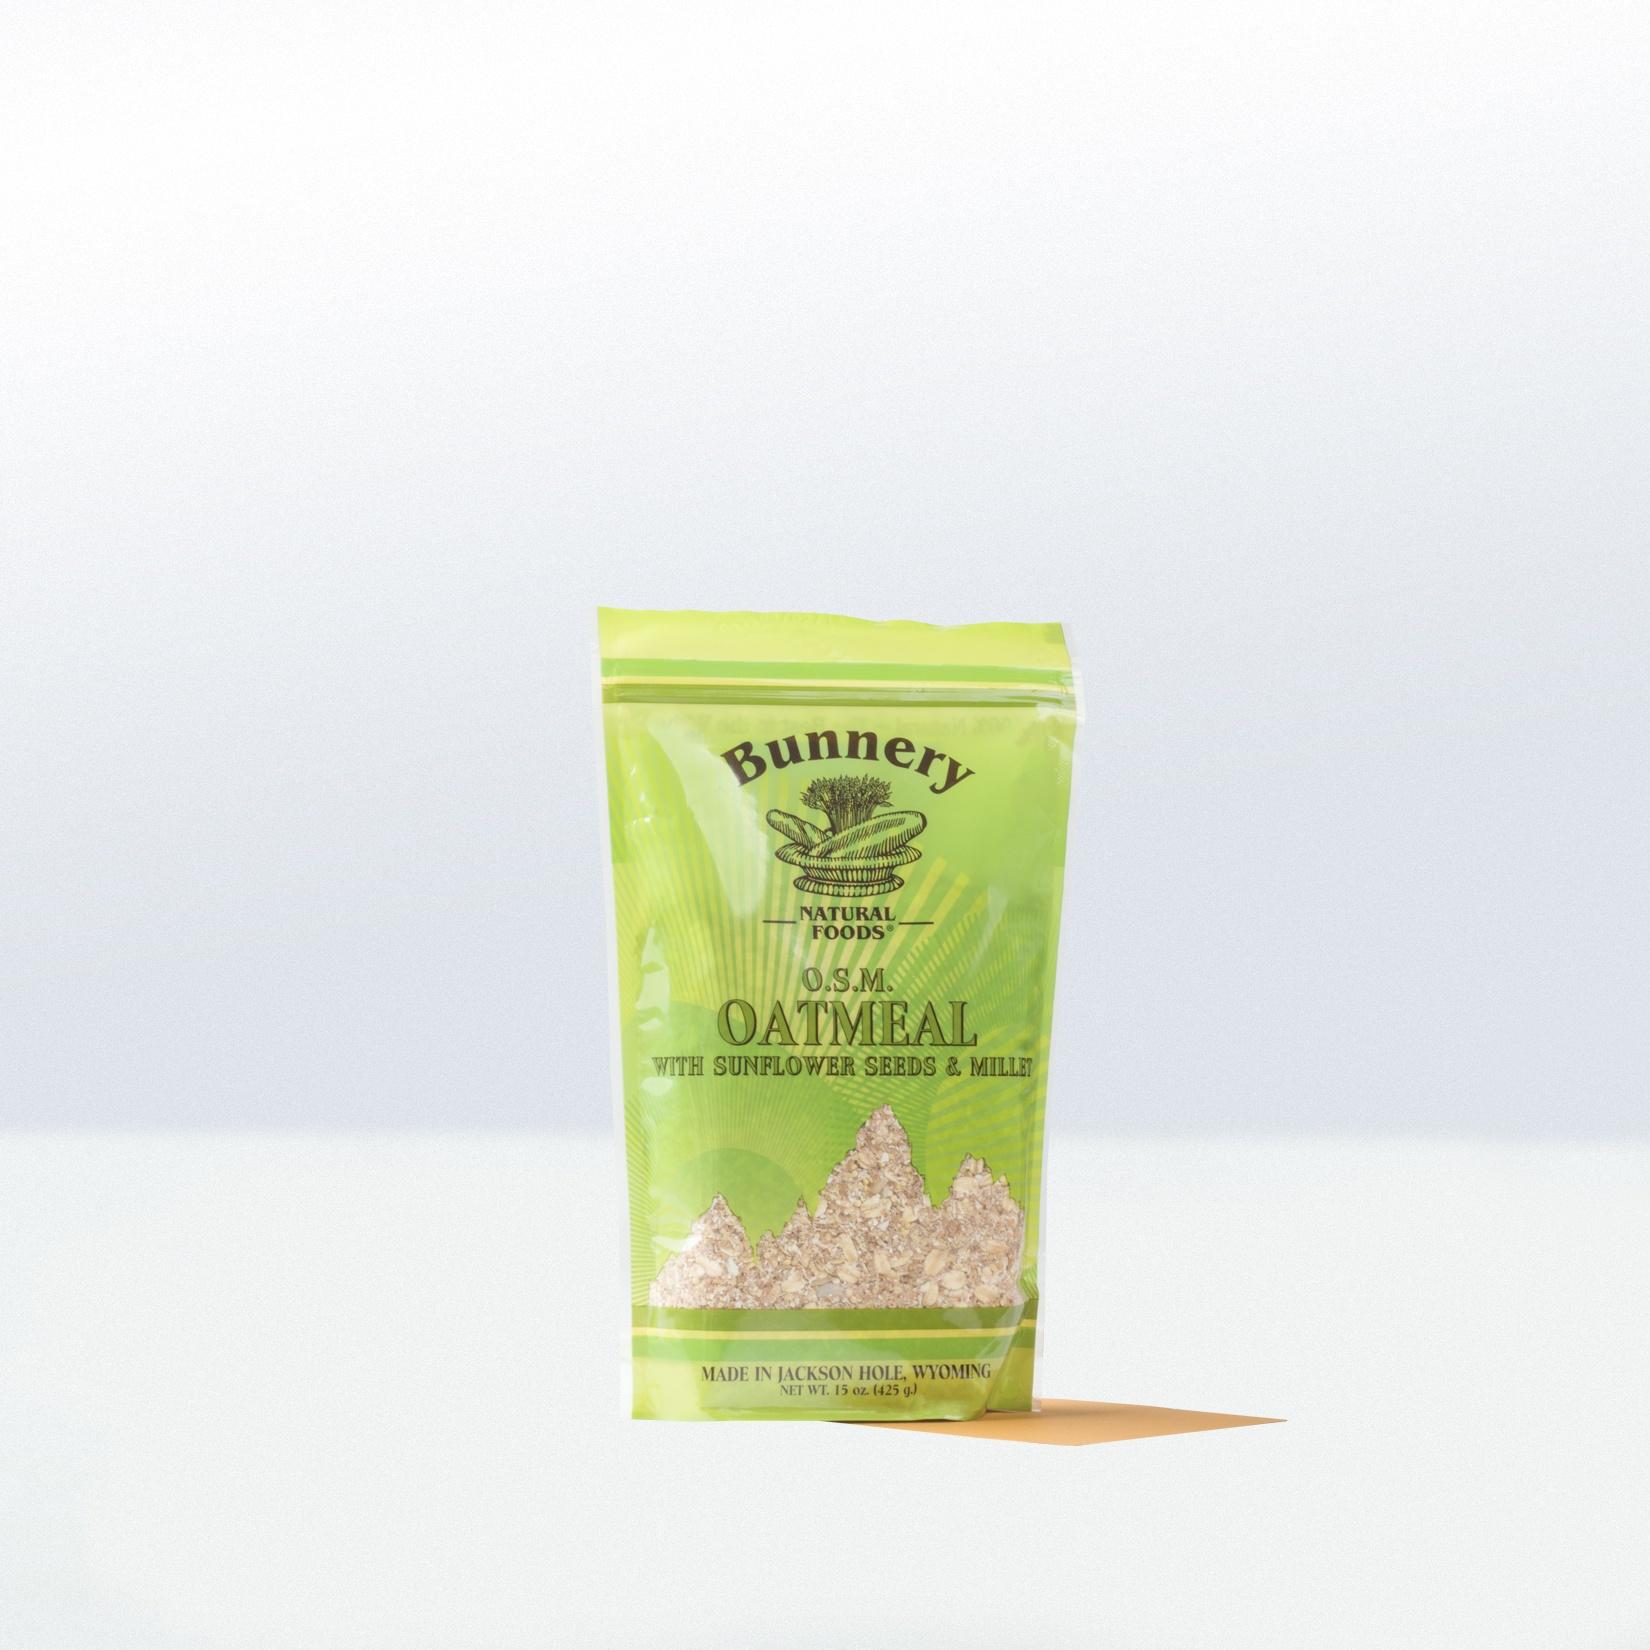 Bunnery Natural Foods-OSM Oatmeal